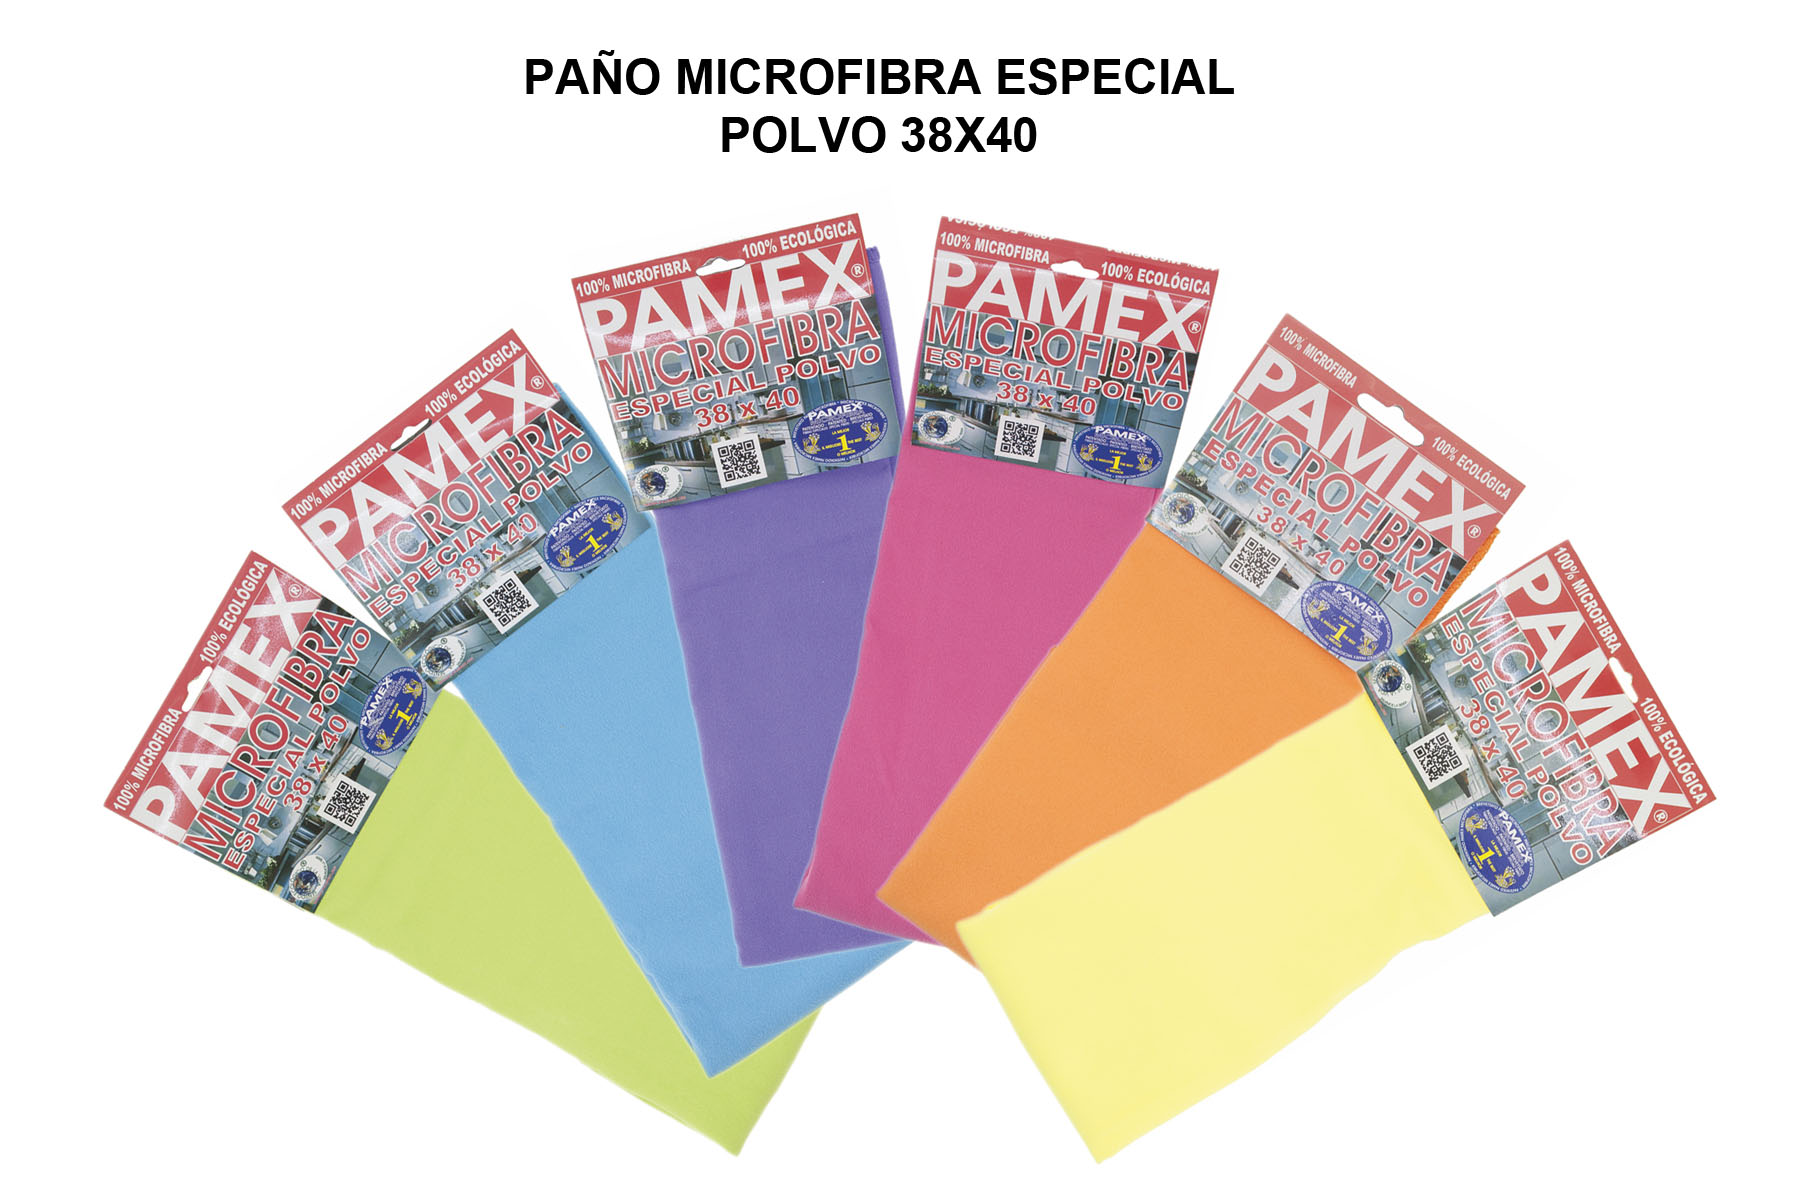 PAÑO MICROFIBRA ESPECIAL POLVO 38X40